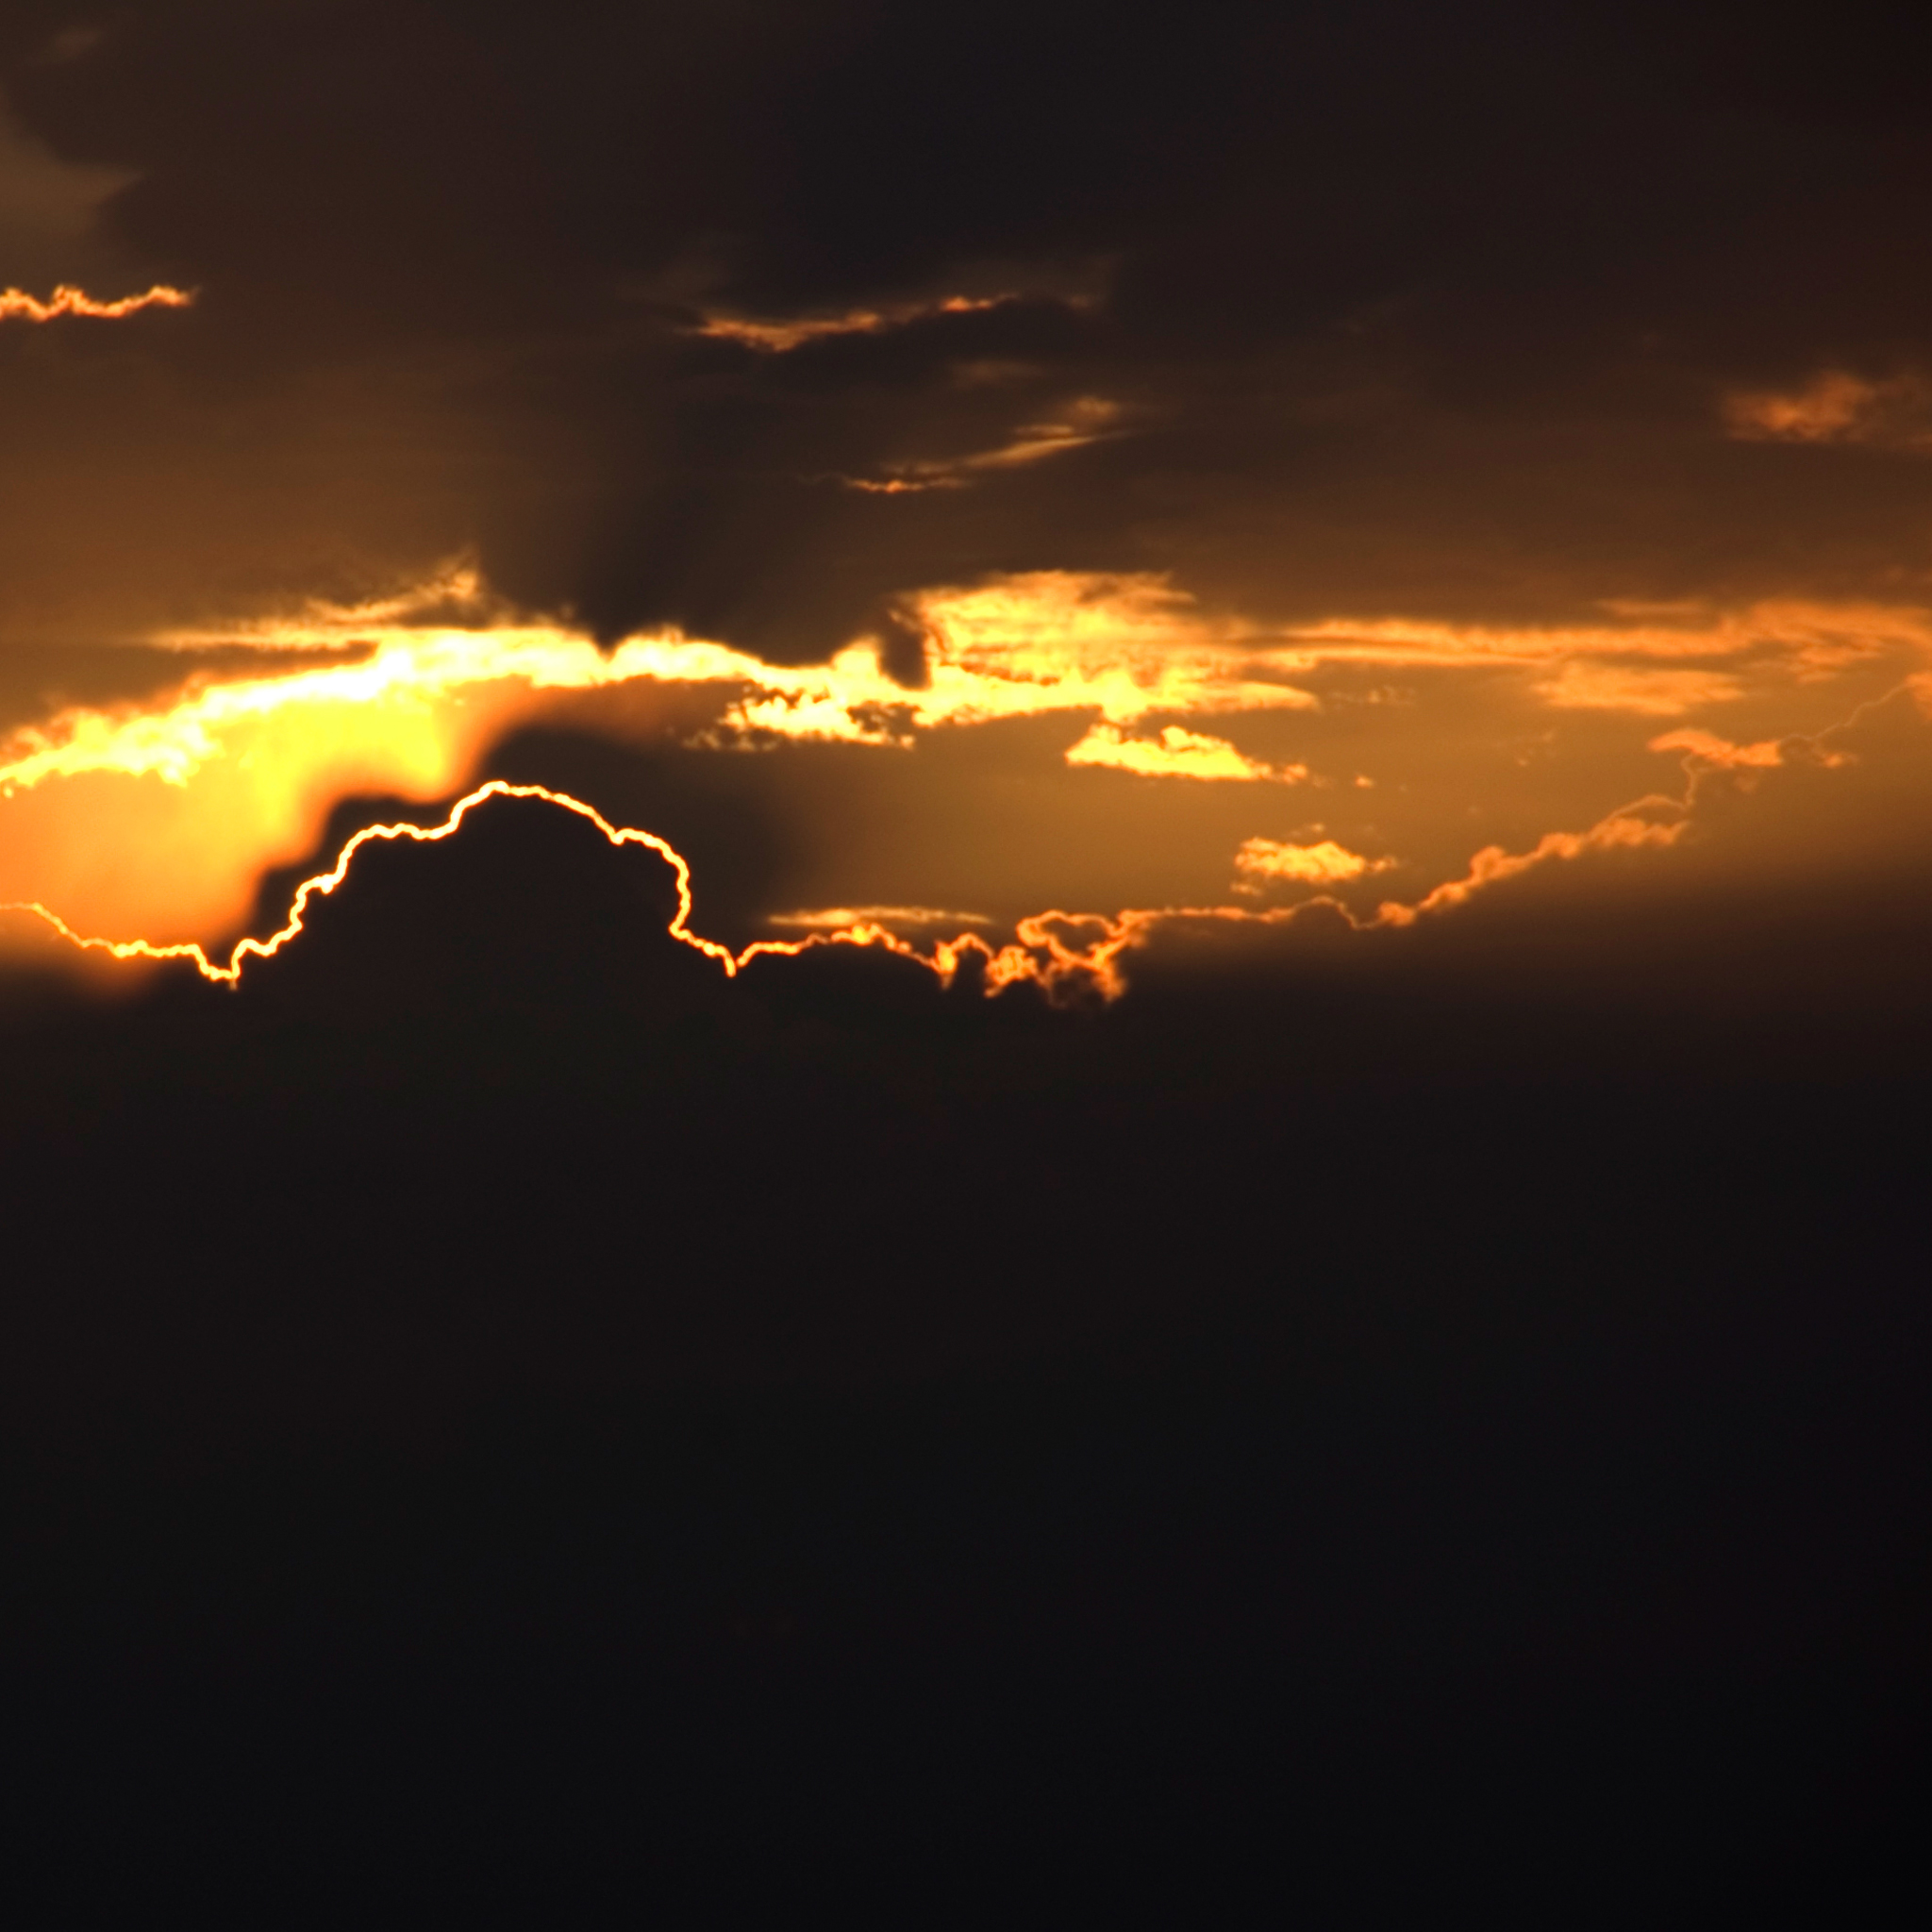 Sunset-Cloud-3Wallpapers-iPad